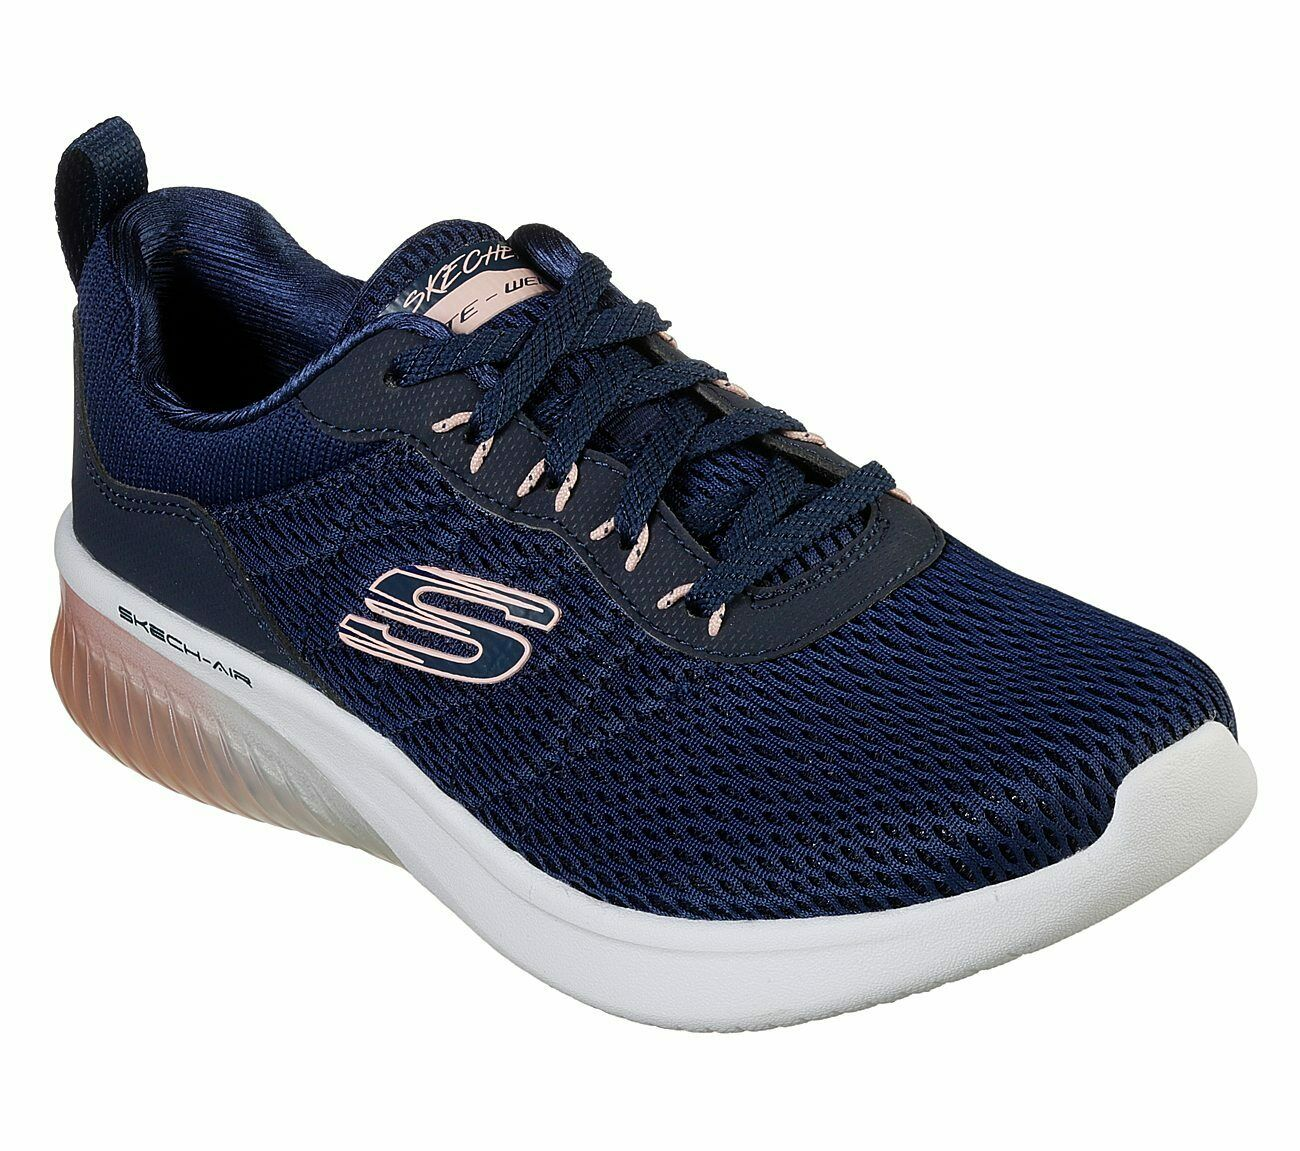 Skechers Skech-Air Ultra Flex Entrenadores Zapatos Para Mujer Malla Malla Malla Deportivo Acolchado 13290 bc987f